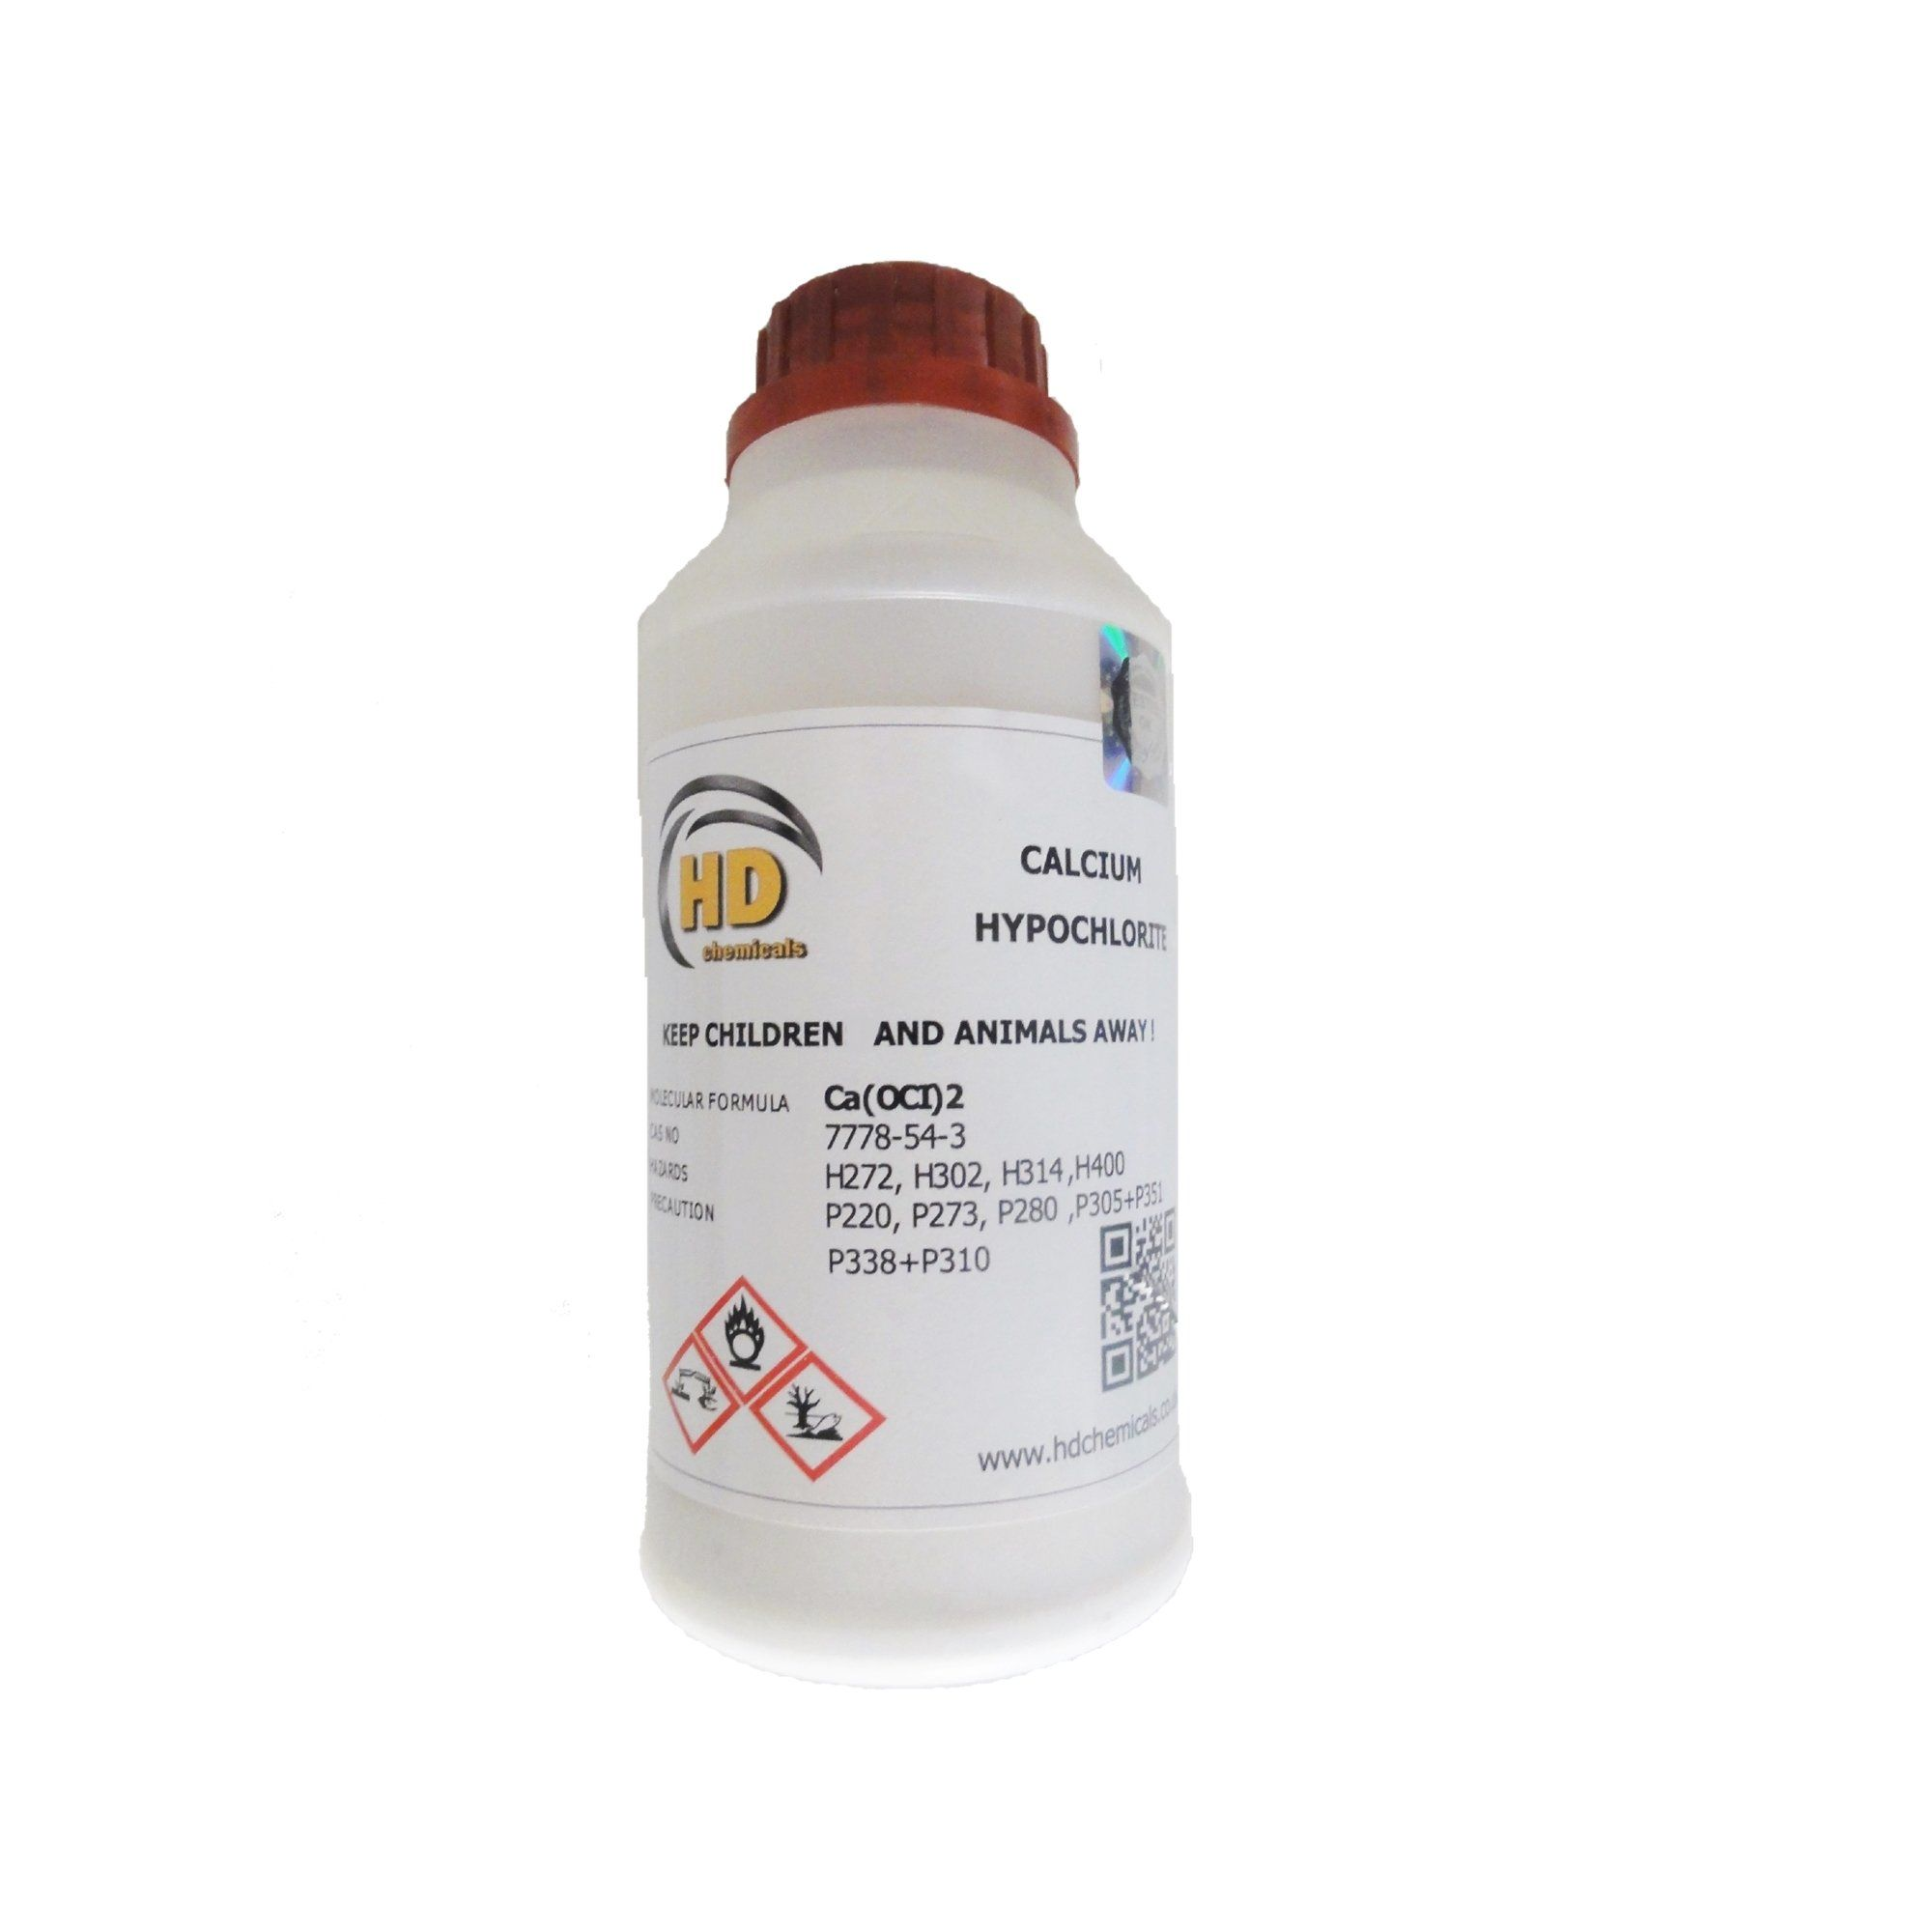 Hd Chemicals 400g Calcium Hypochlorite Powder Swimming Pool Shock Bleaching Disinfectant Calcium Hypochlorit In 2020 Pool Shock Swimming Pools Swimming Pool Water